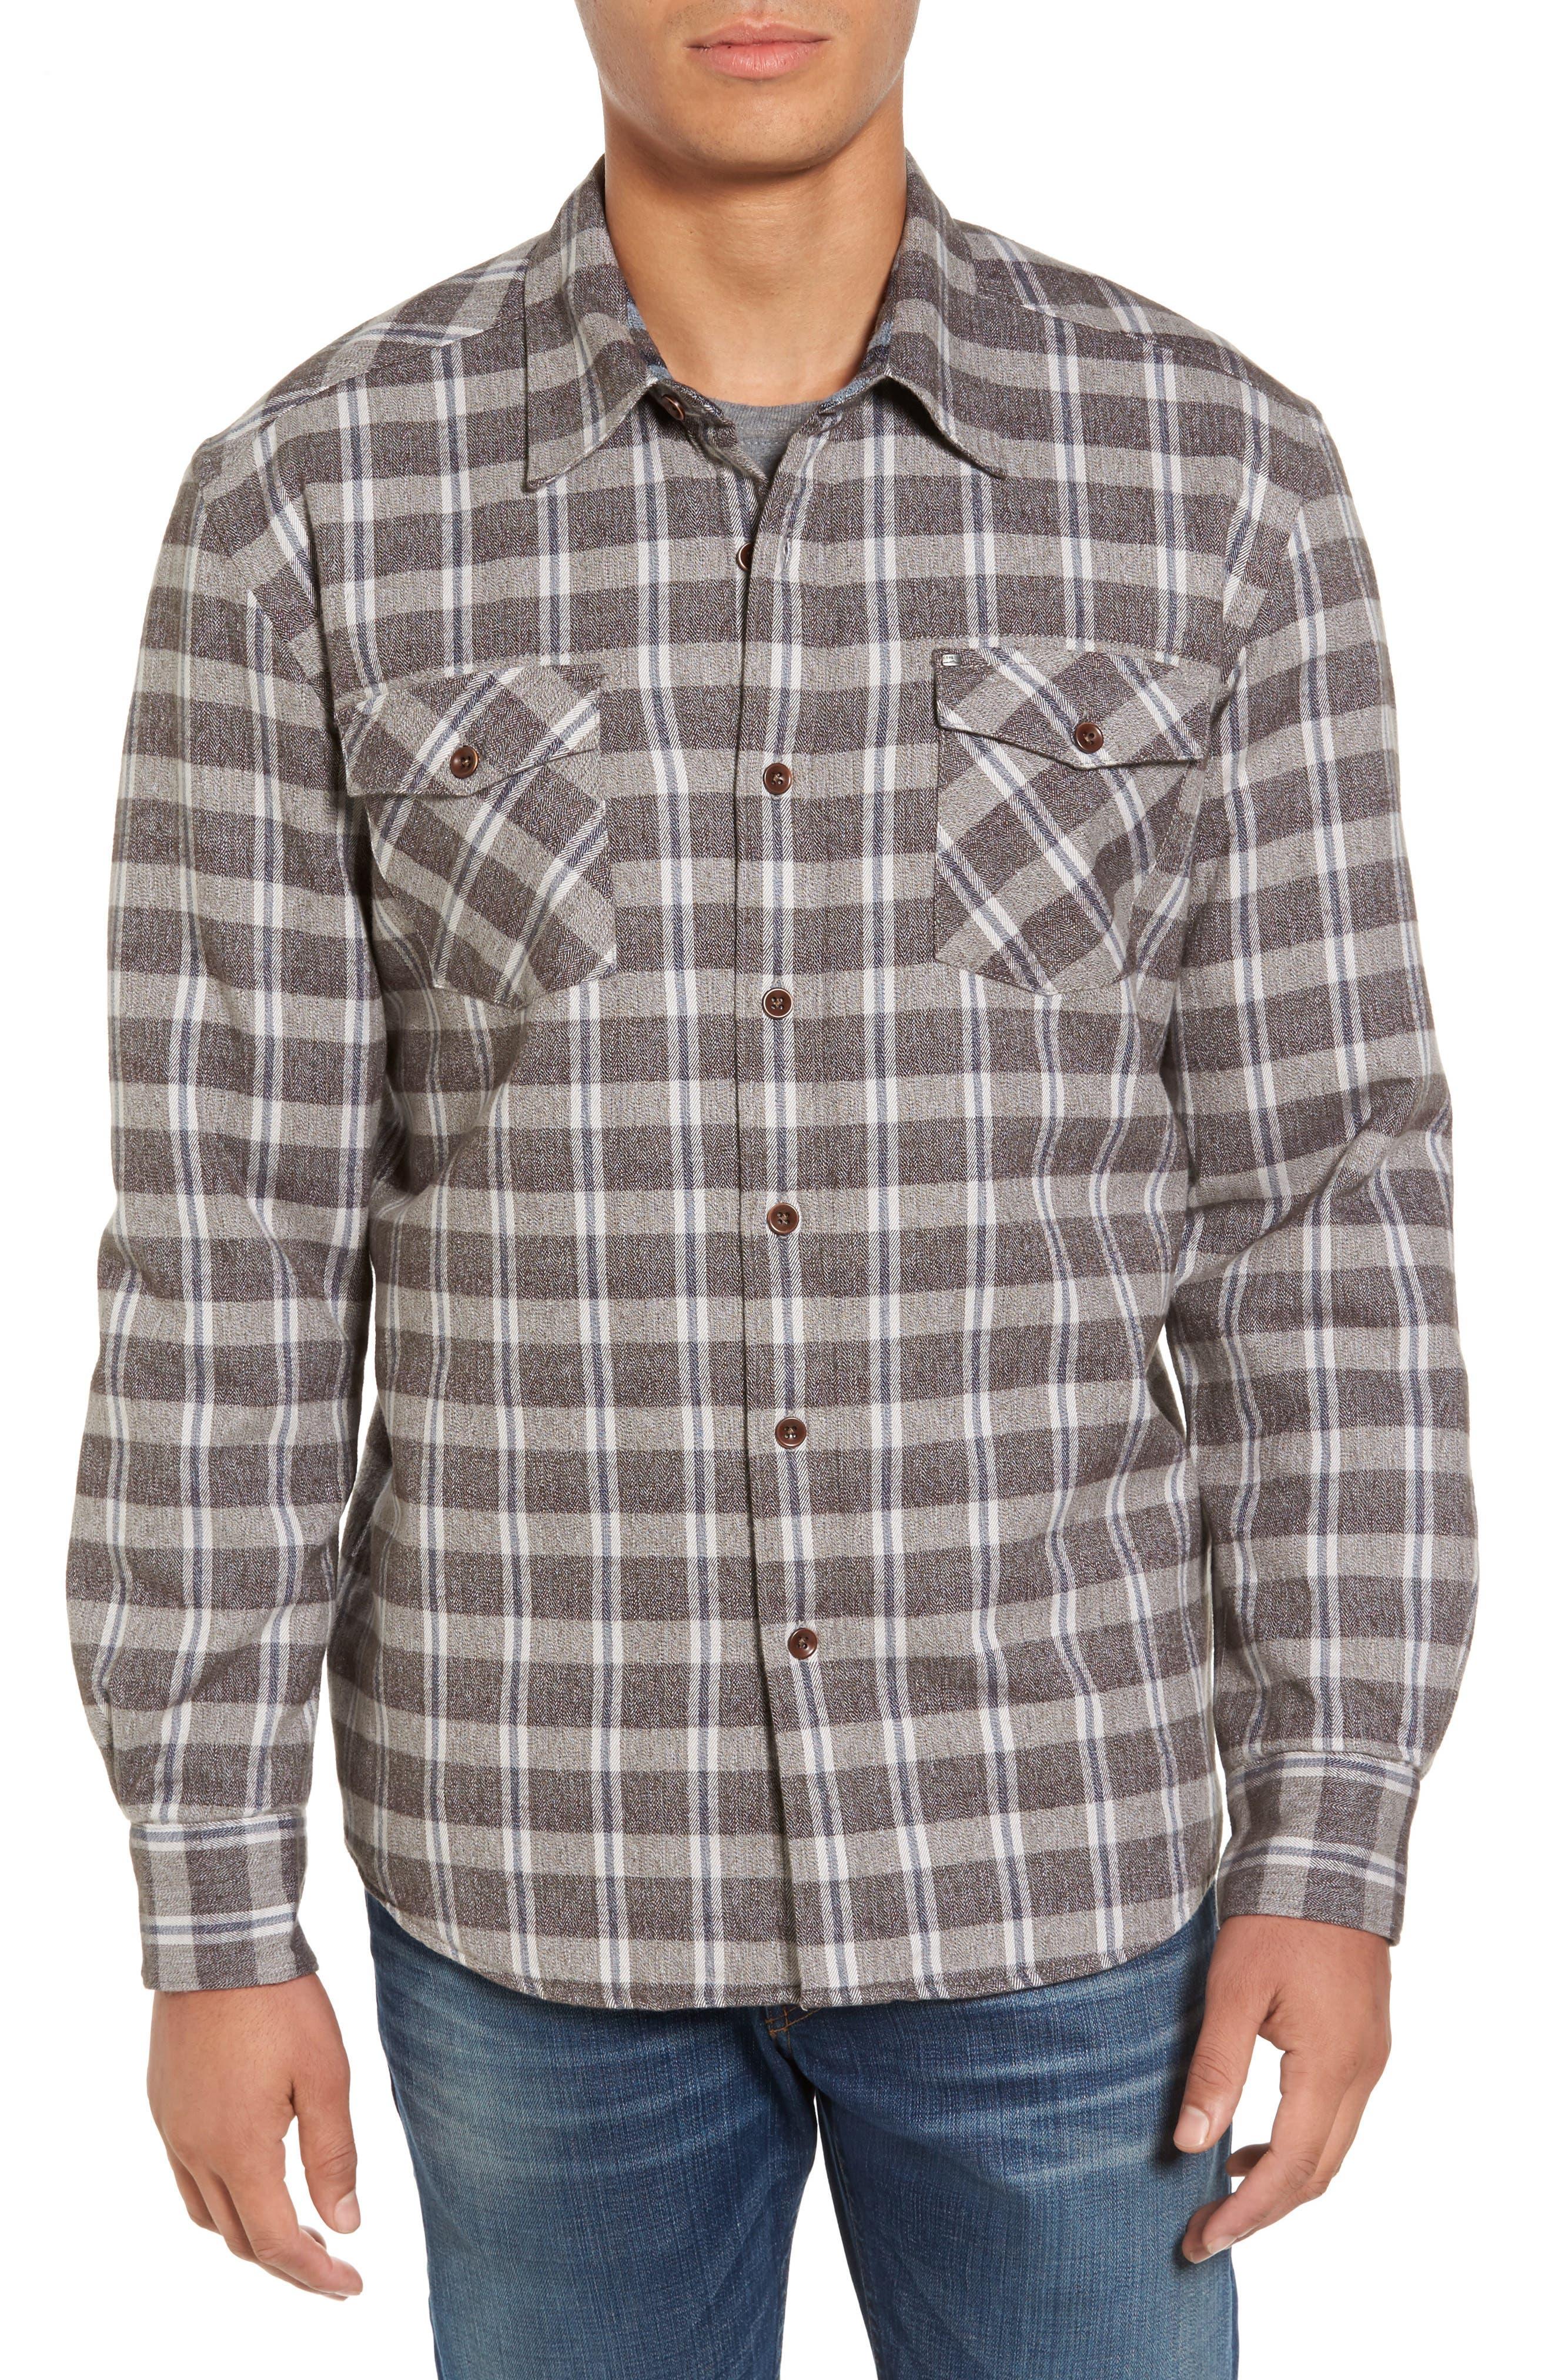 Cova Emerald Bay Regular Fit Plaid Shirt Jacket